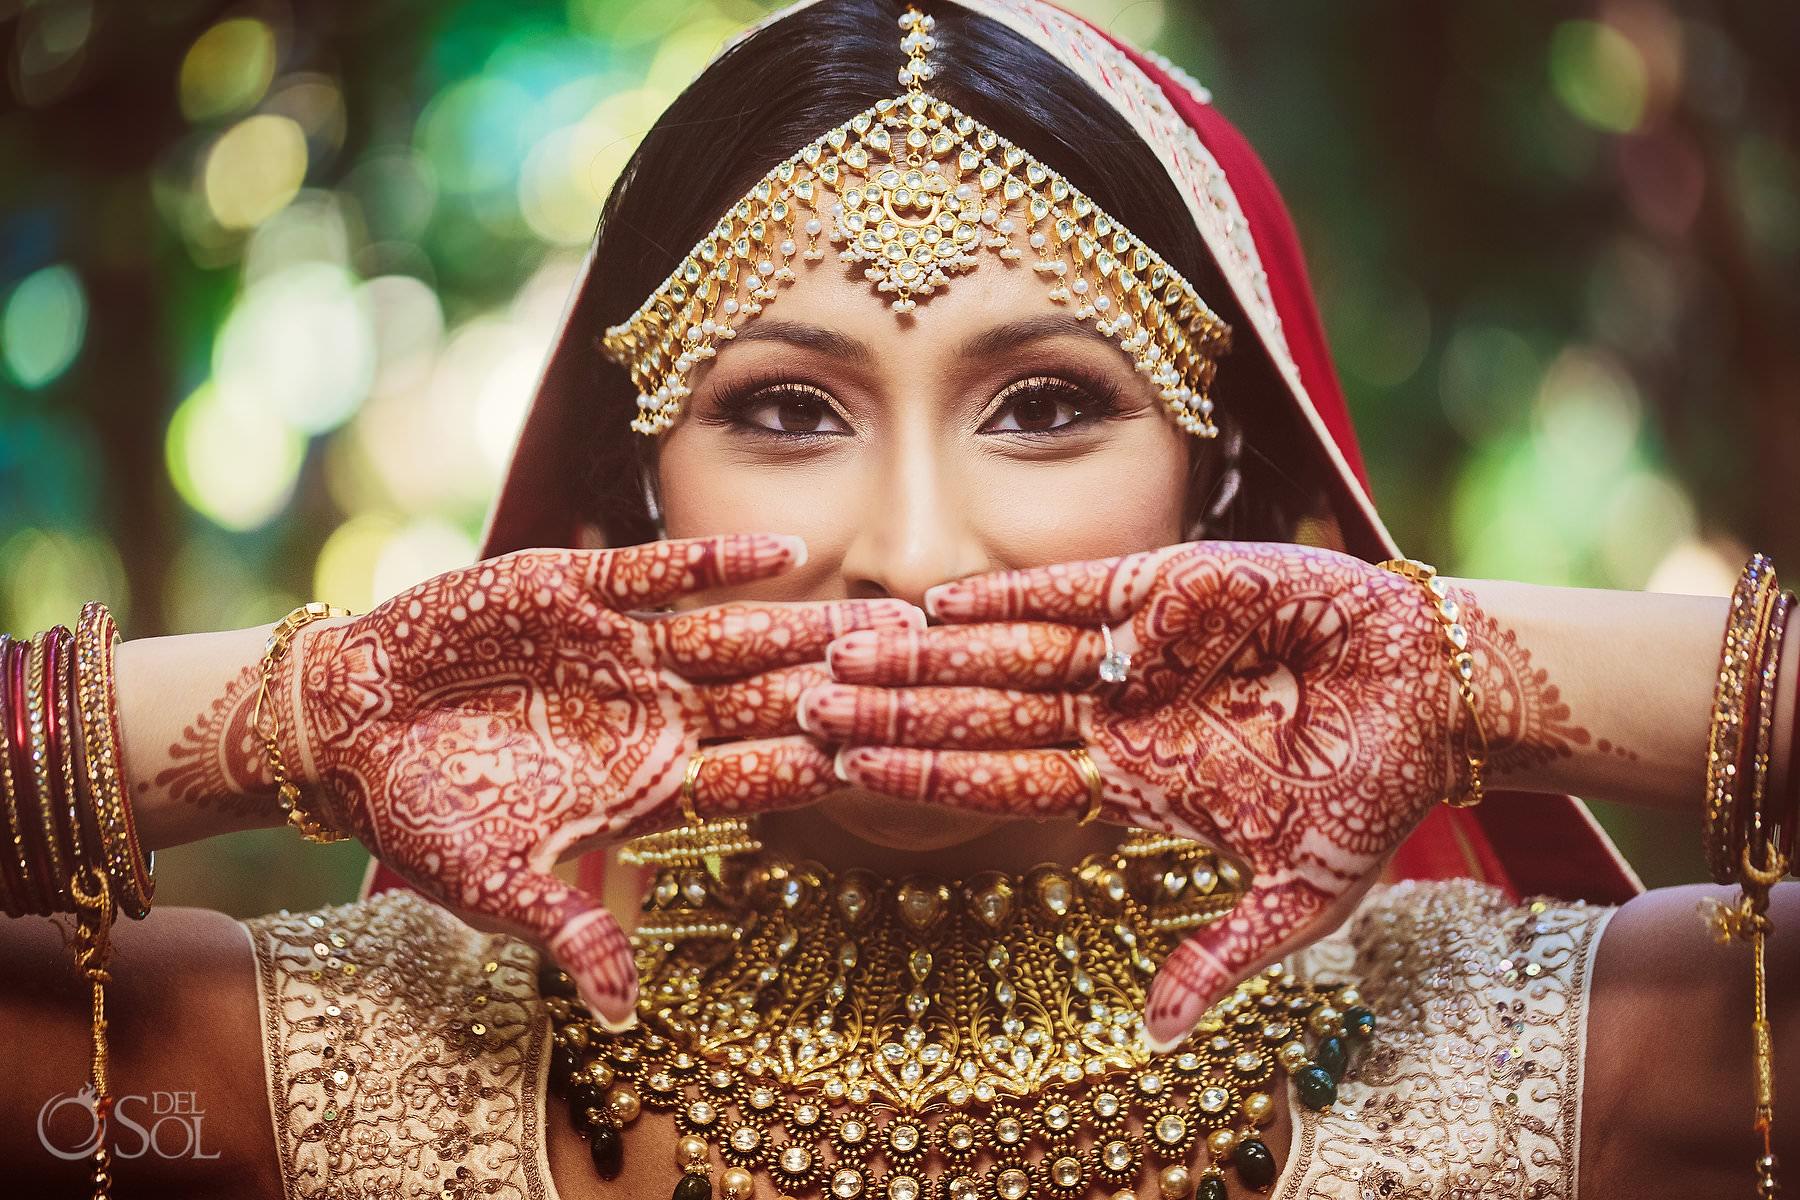 South Asian bride portrait showing Mehendi Dreams Tulum Riviera Maya Mexico